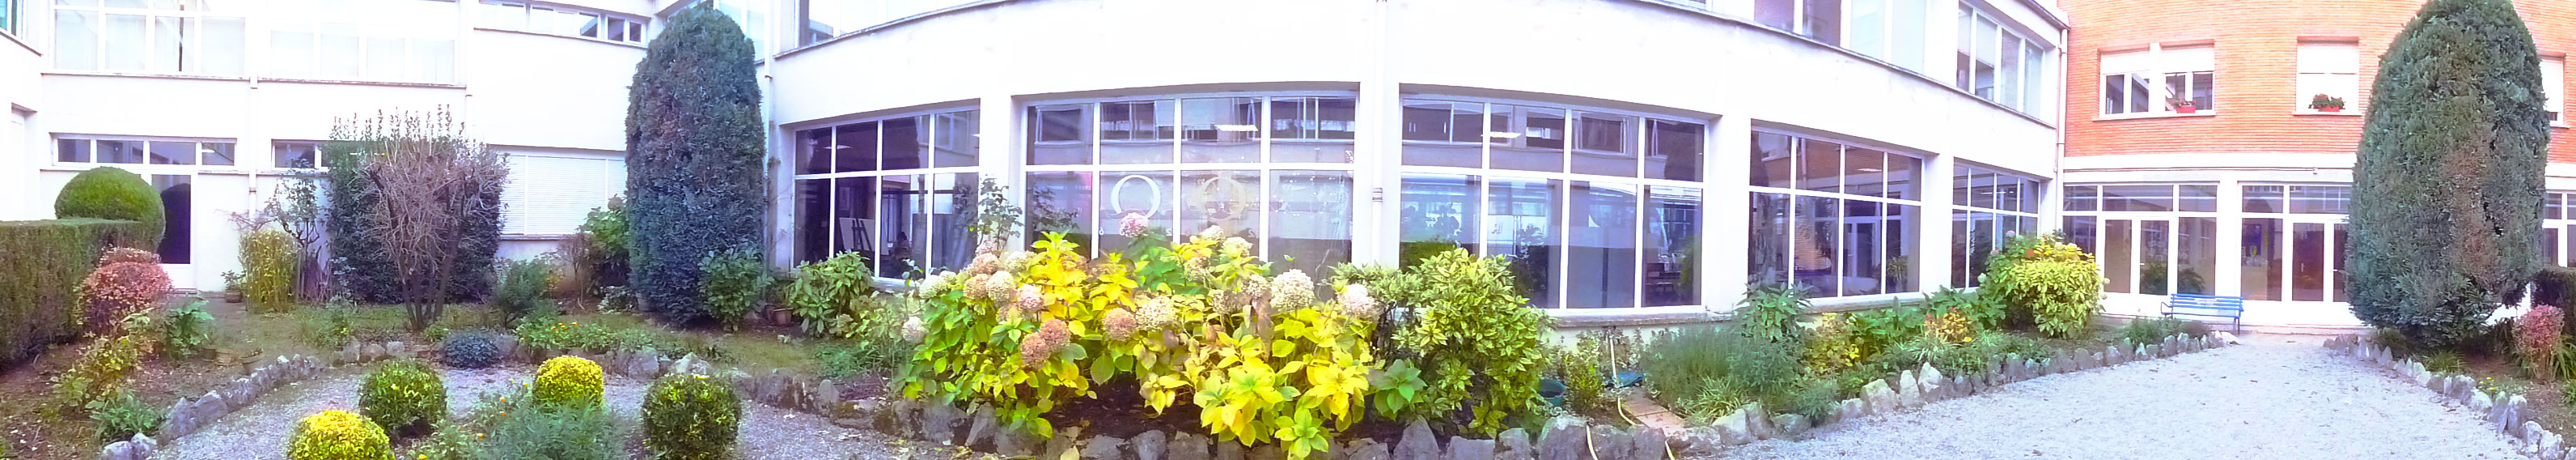 colegio-nino-jesus-ikastetxea-vitoria-gasteiz-jardin